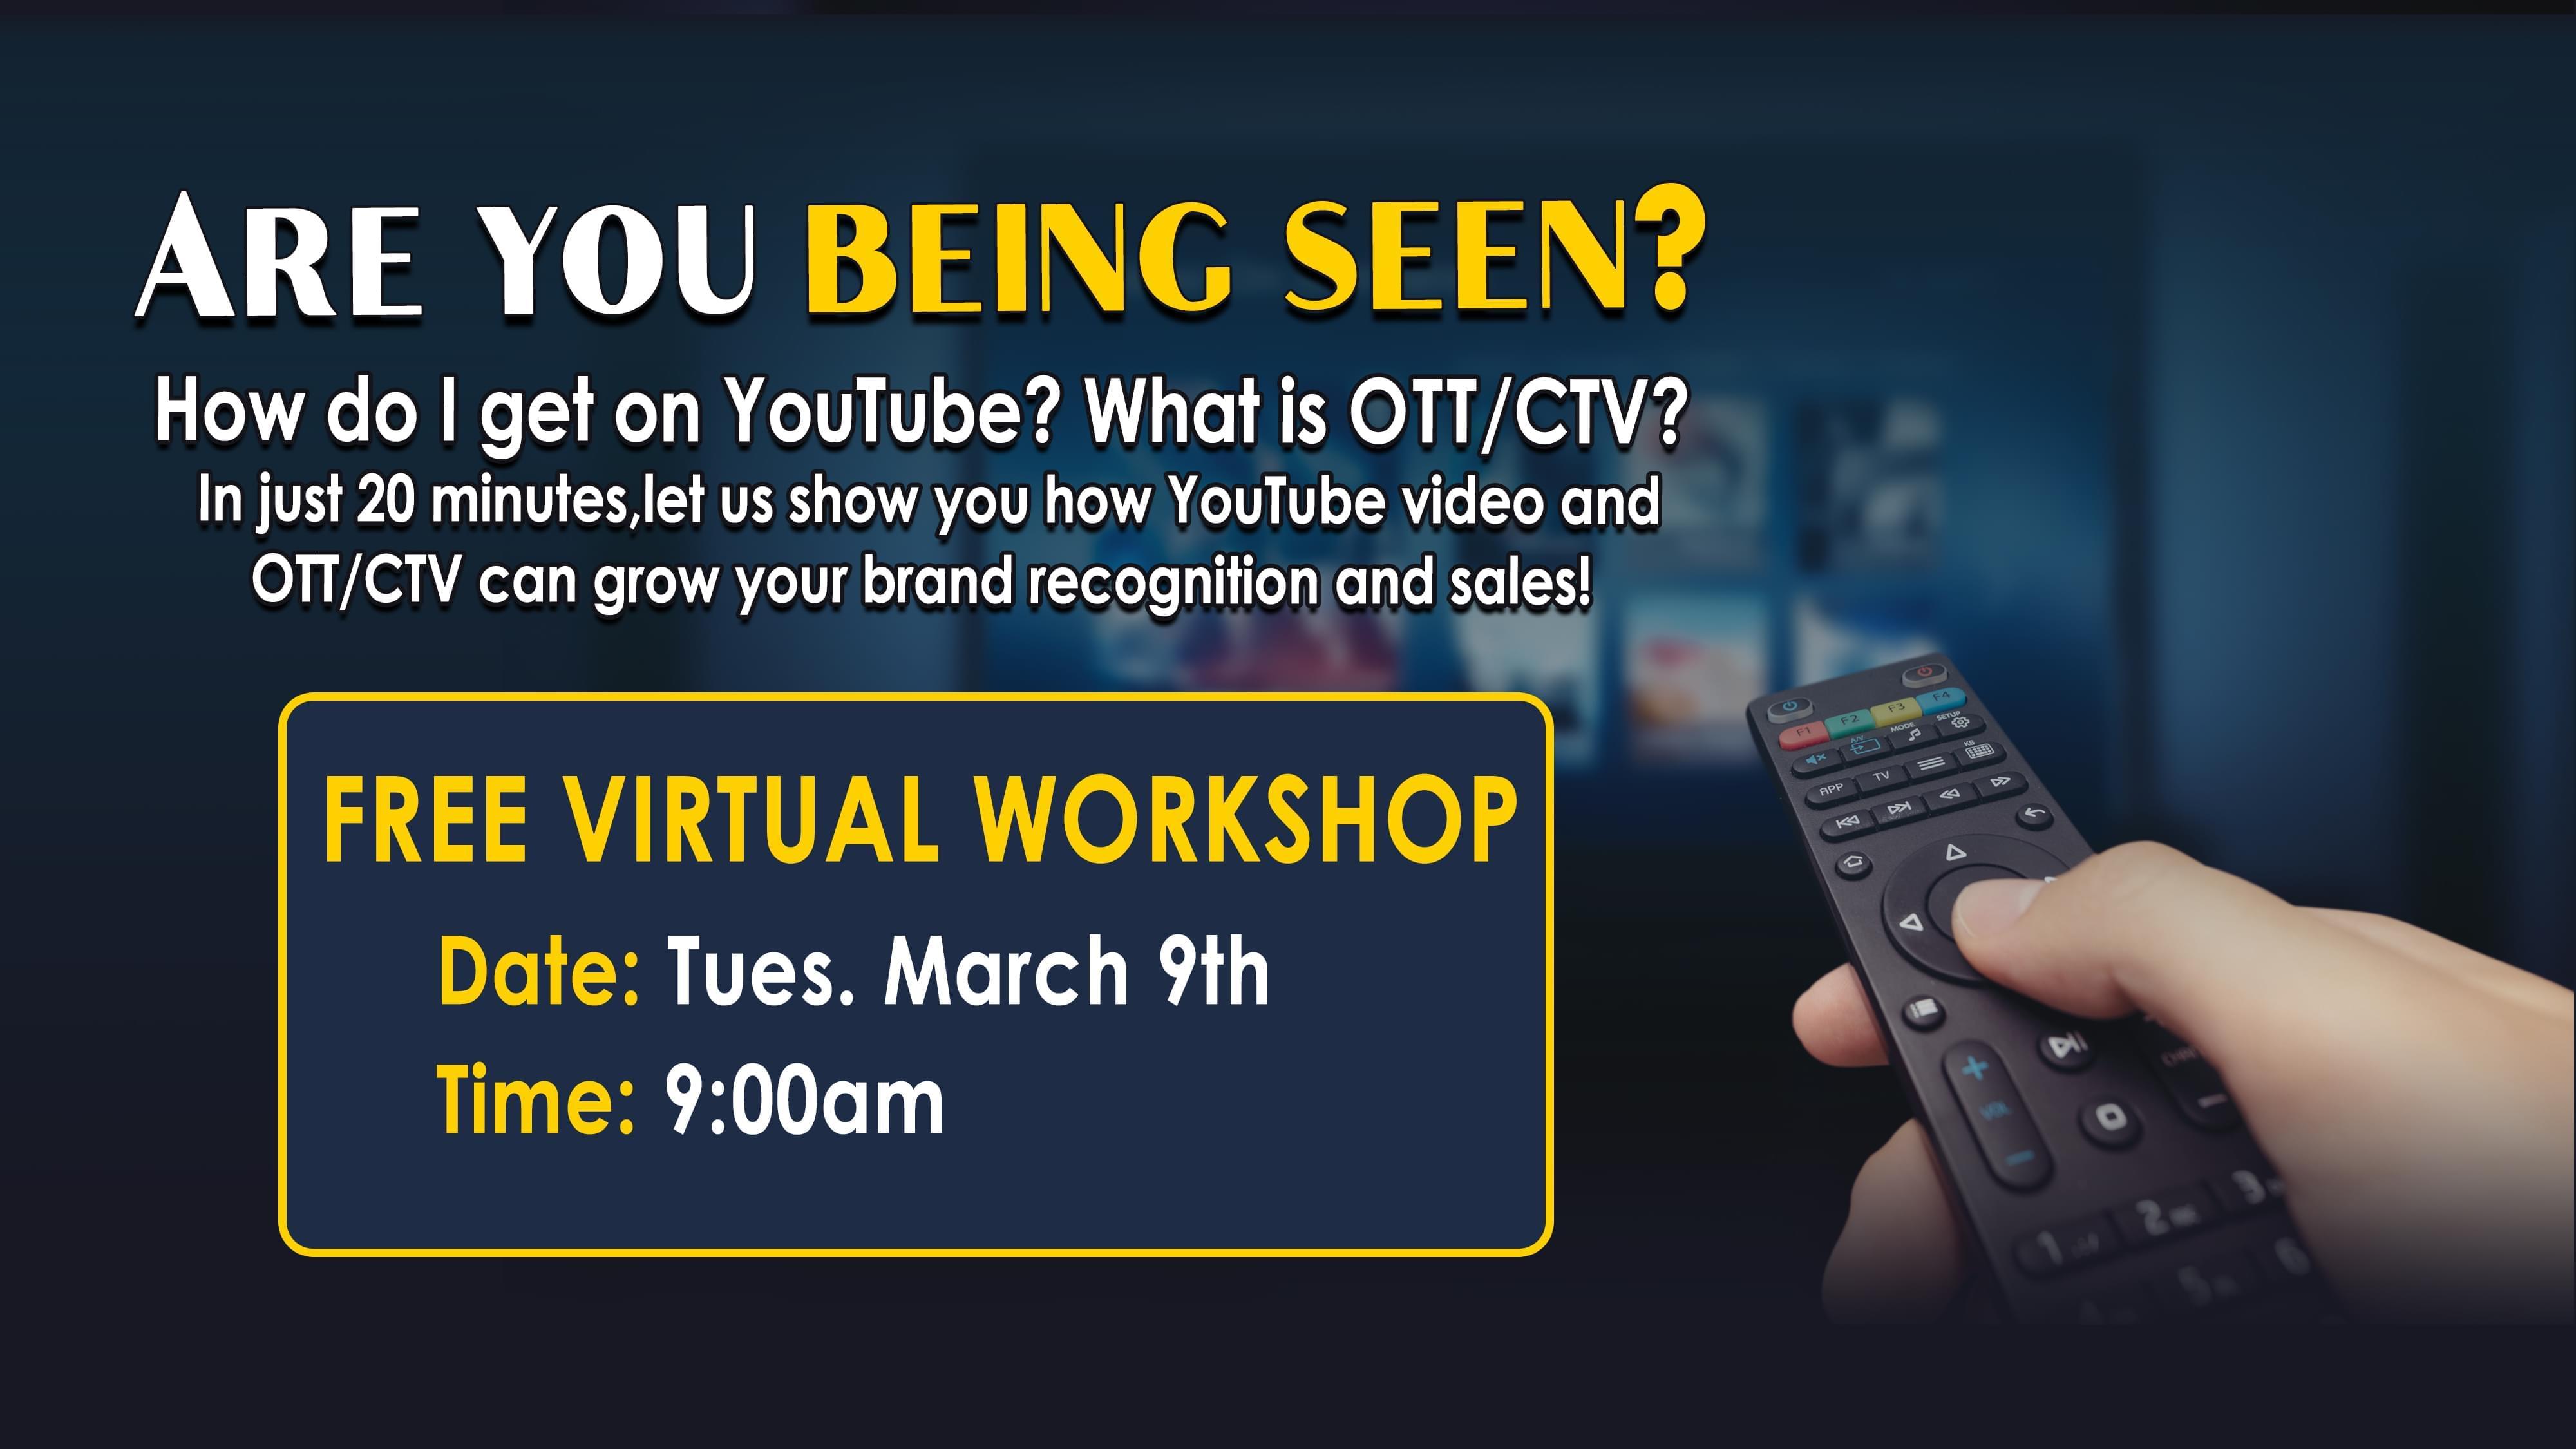 FREE Virtual Workshop